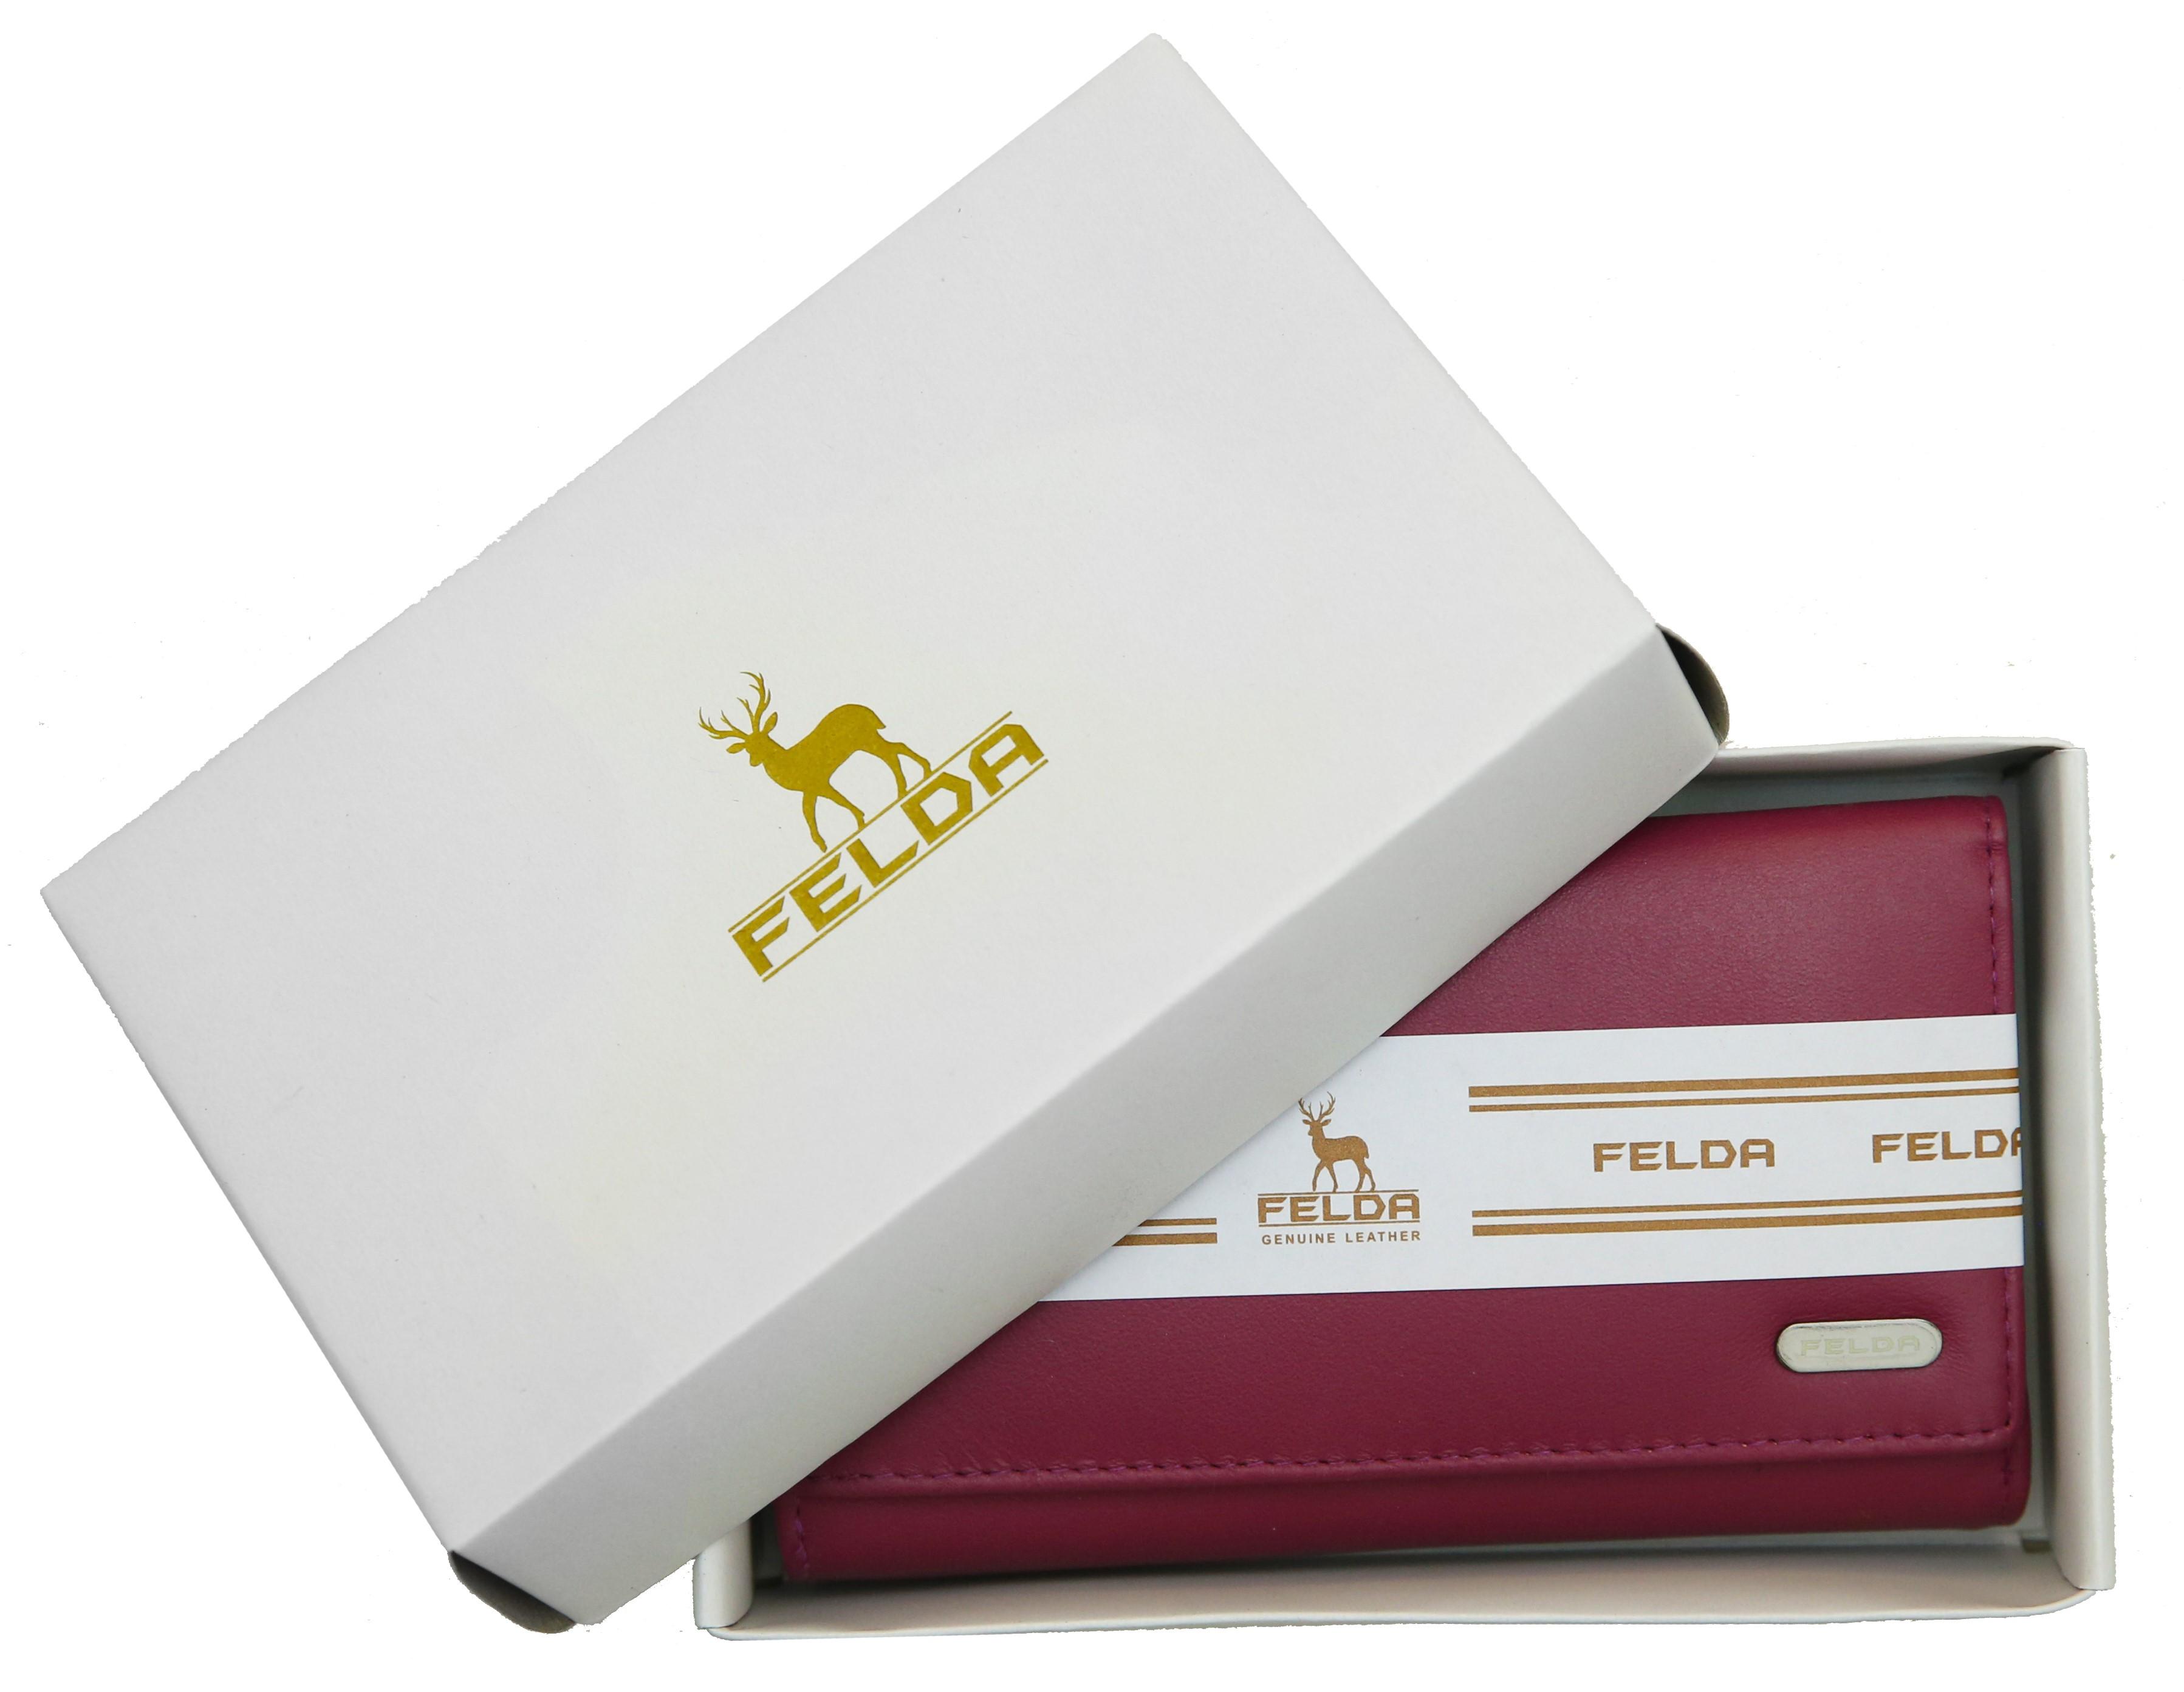 Felda-Portefeuille-pour-cartes-de-credit-cuir-souple-plusieurs-coloris miniature 18